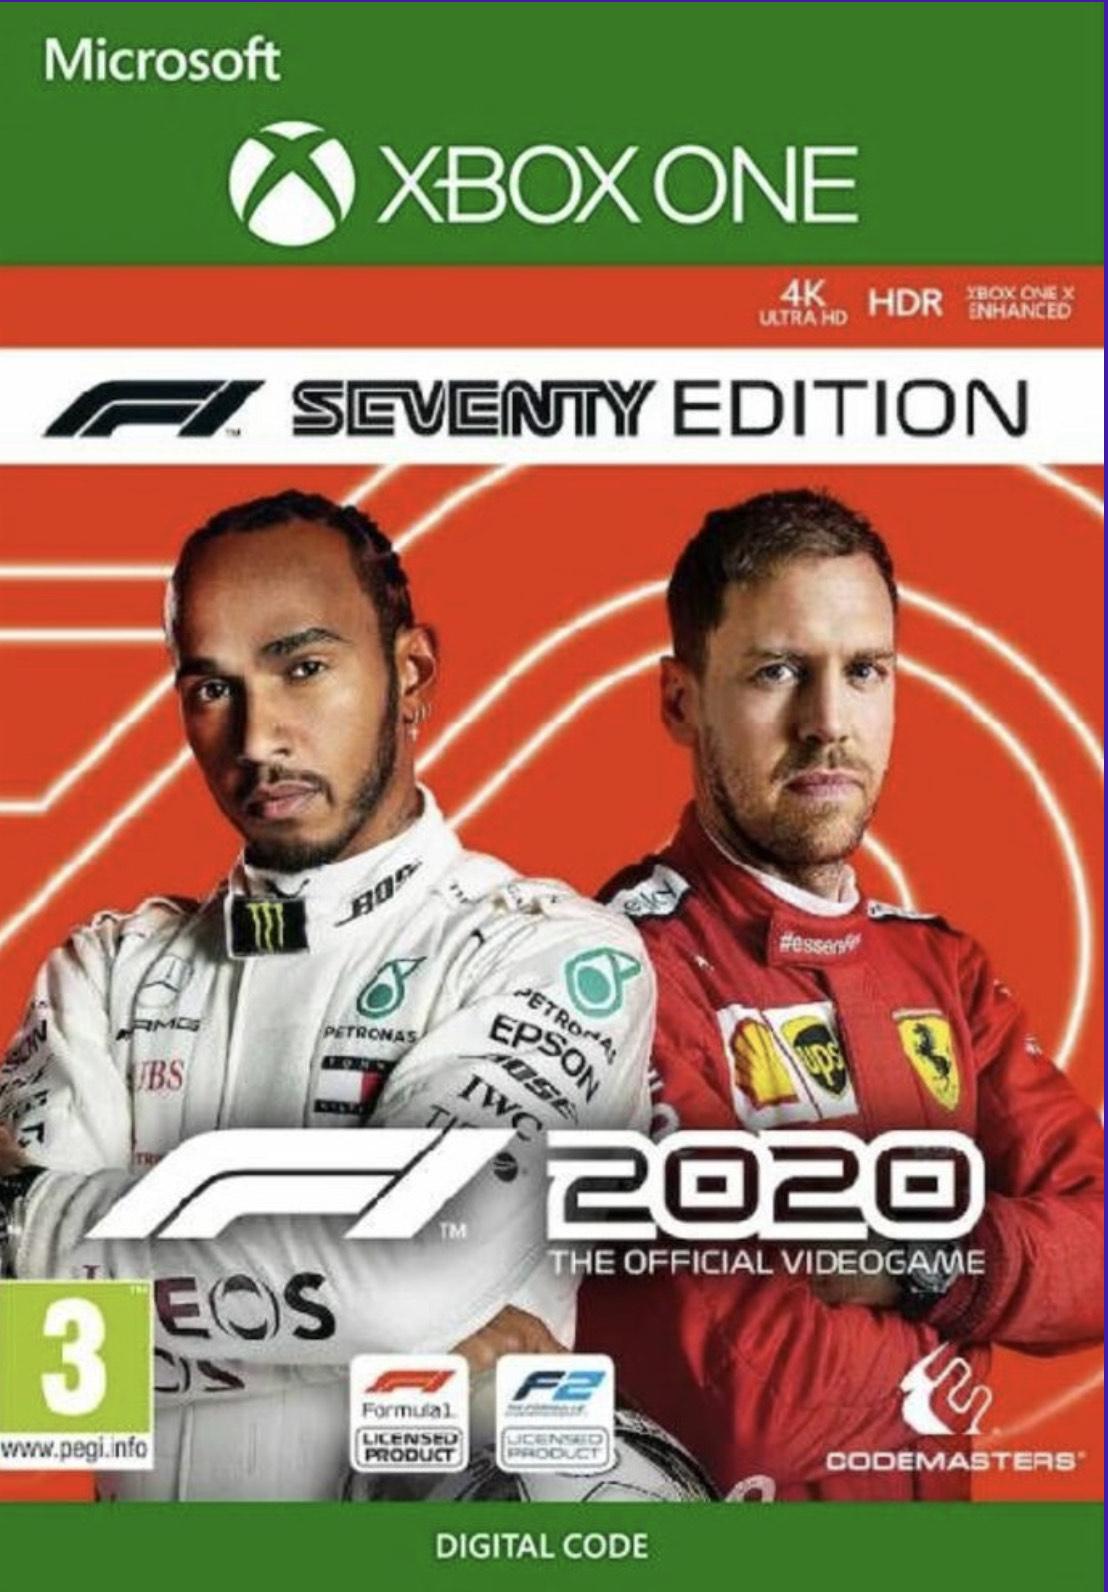 F1 2020 Seventy Edition Xbox One Digital (Argentina) - £17.12 with code @ Eneba